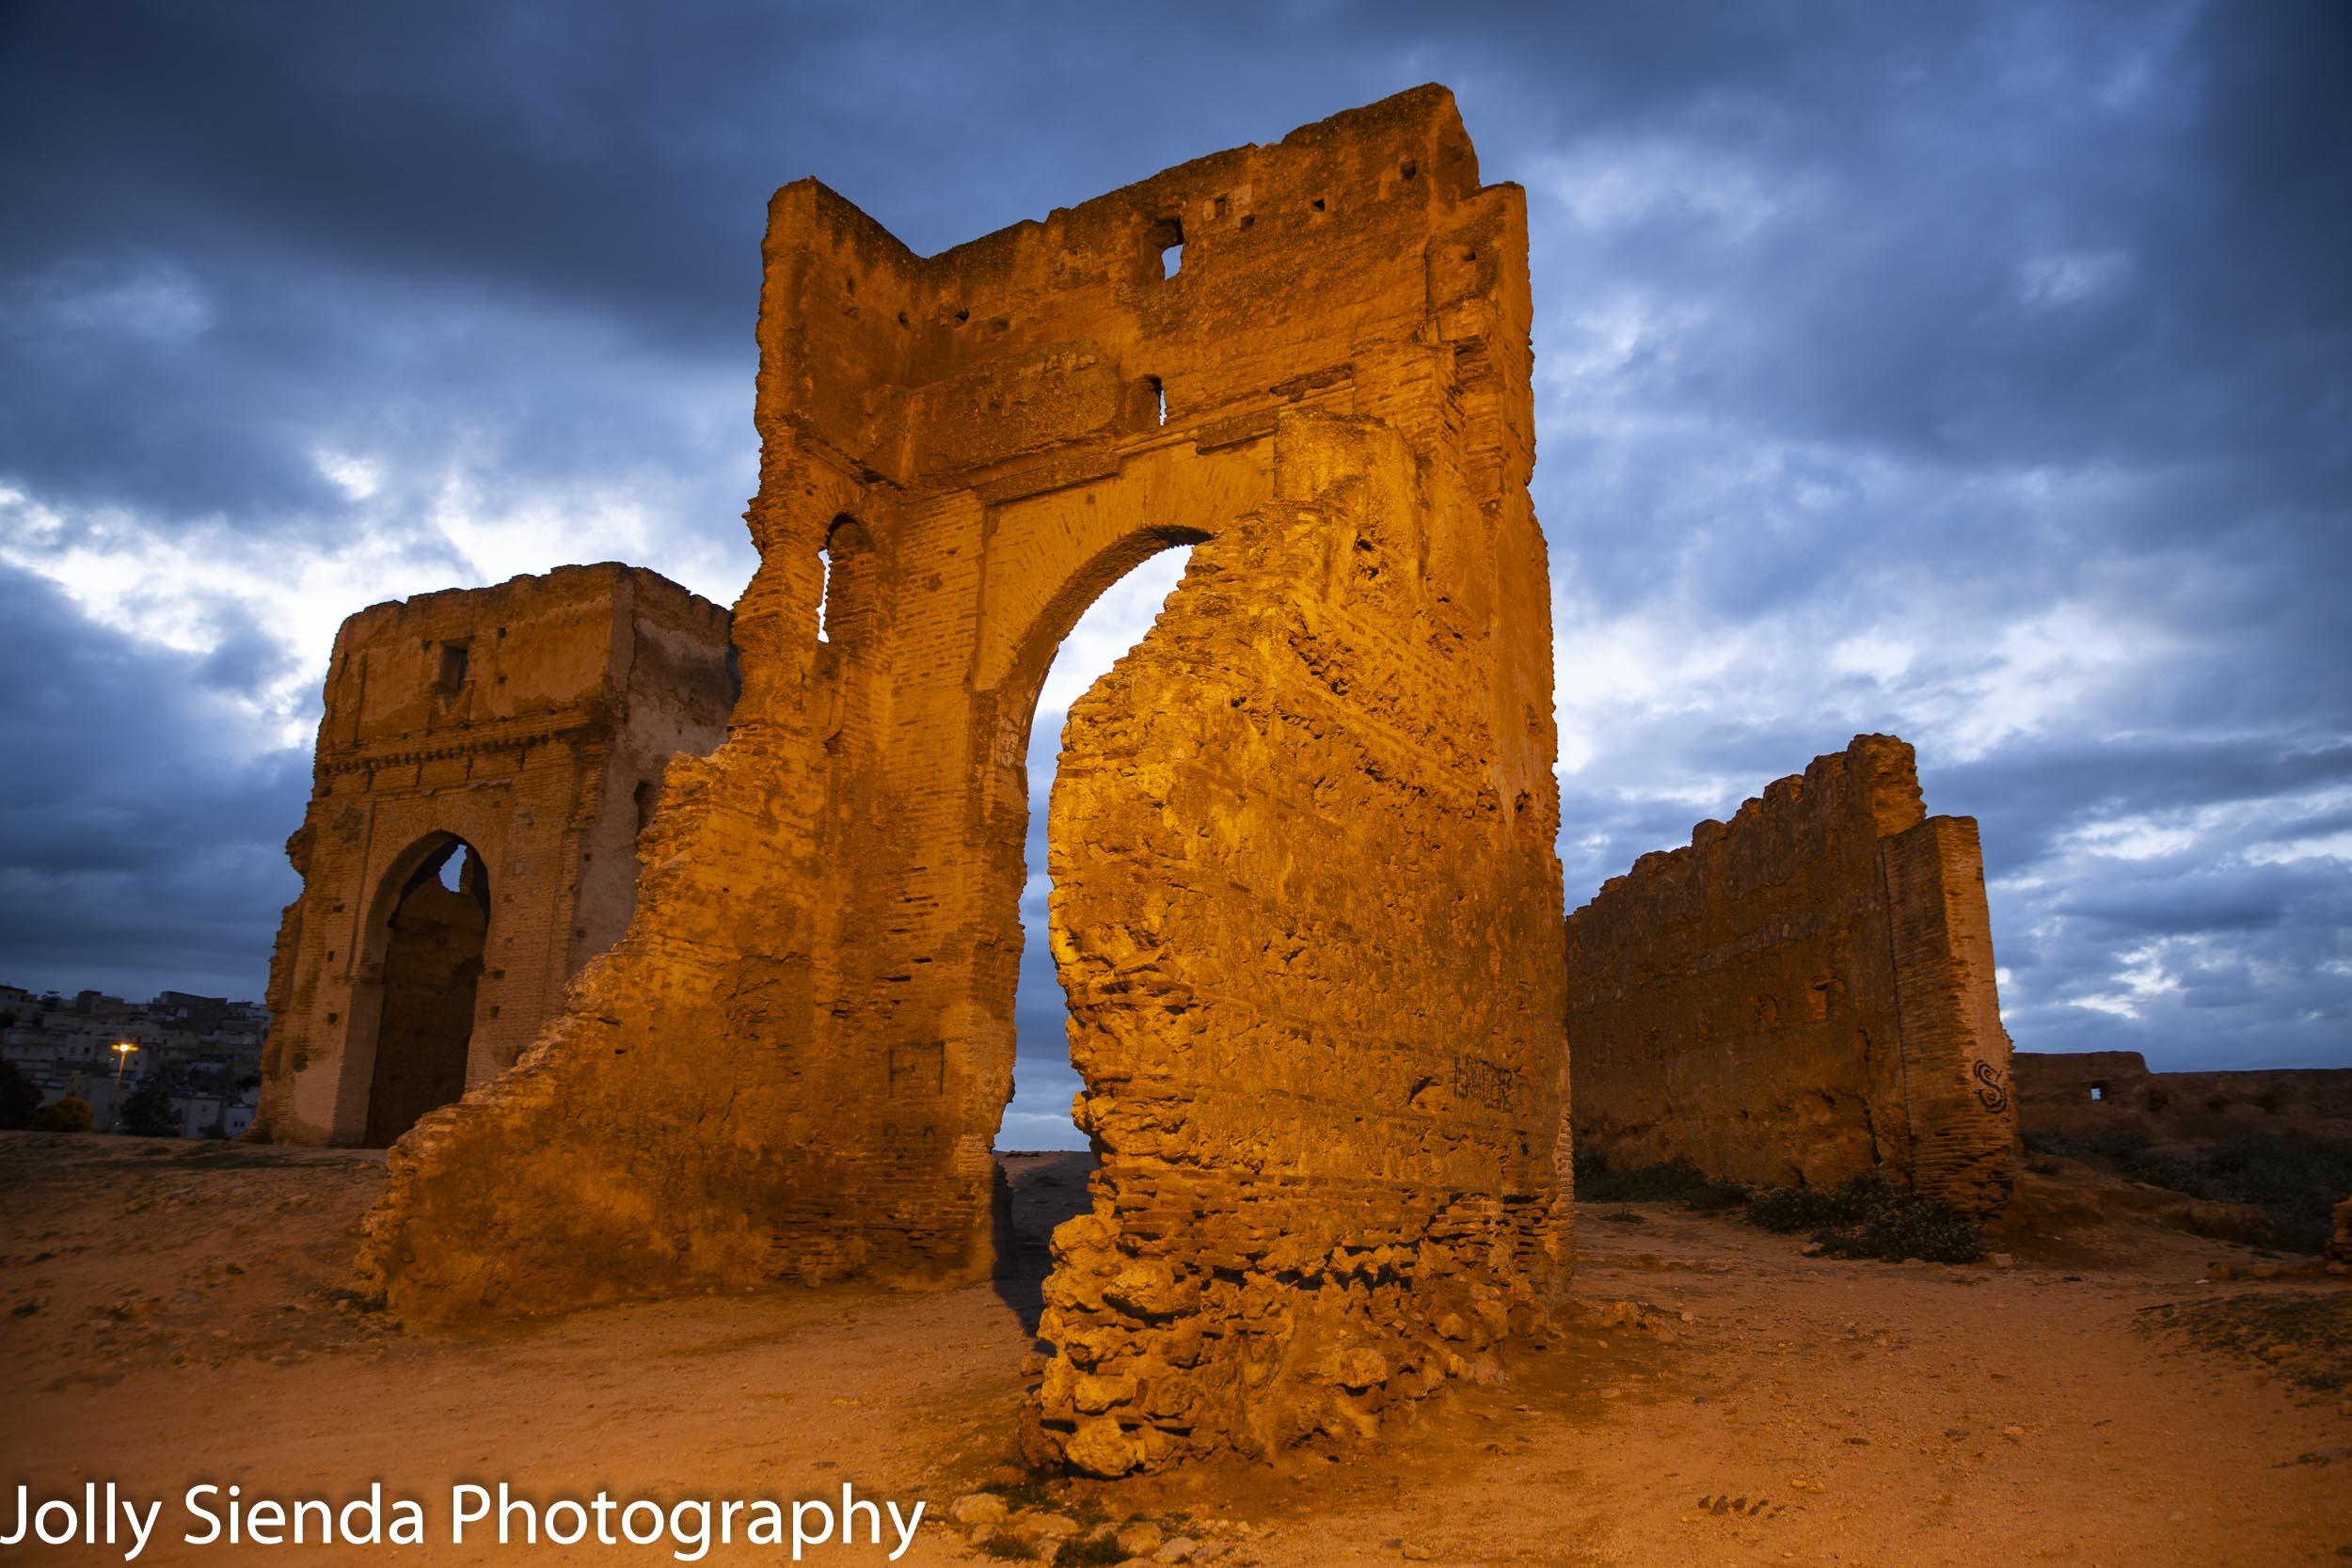 Merinides Tombs at night